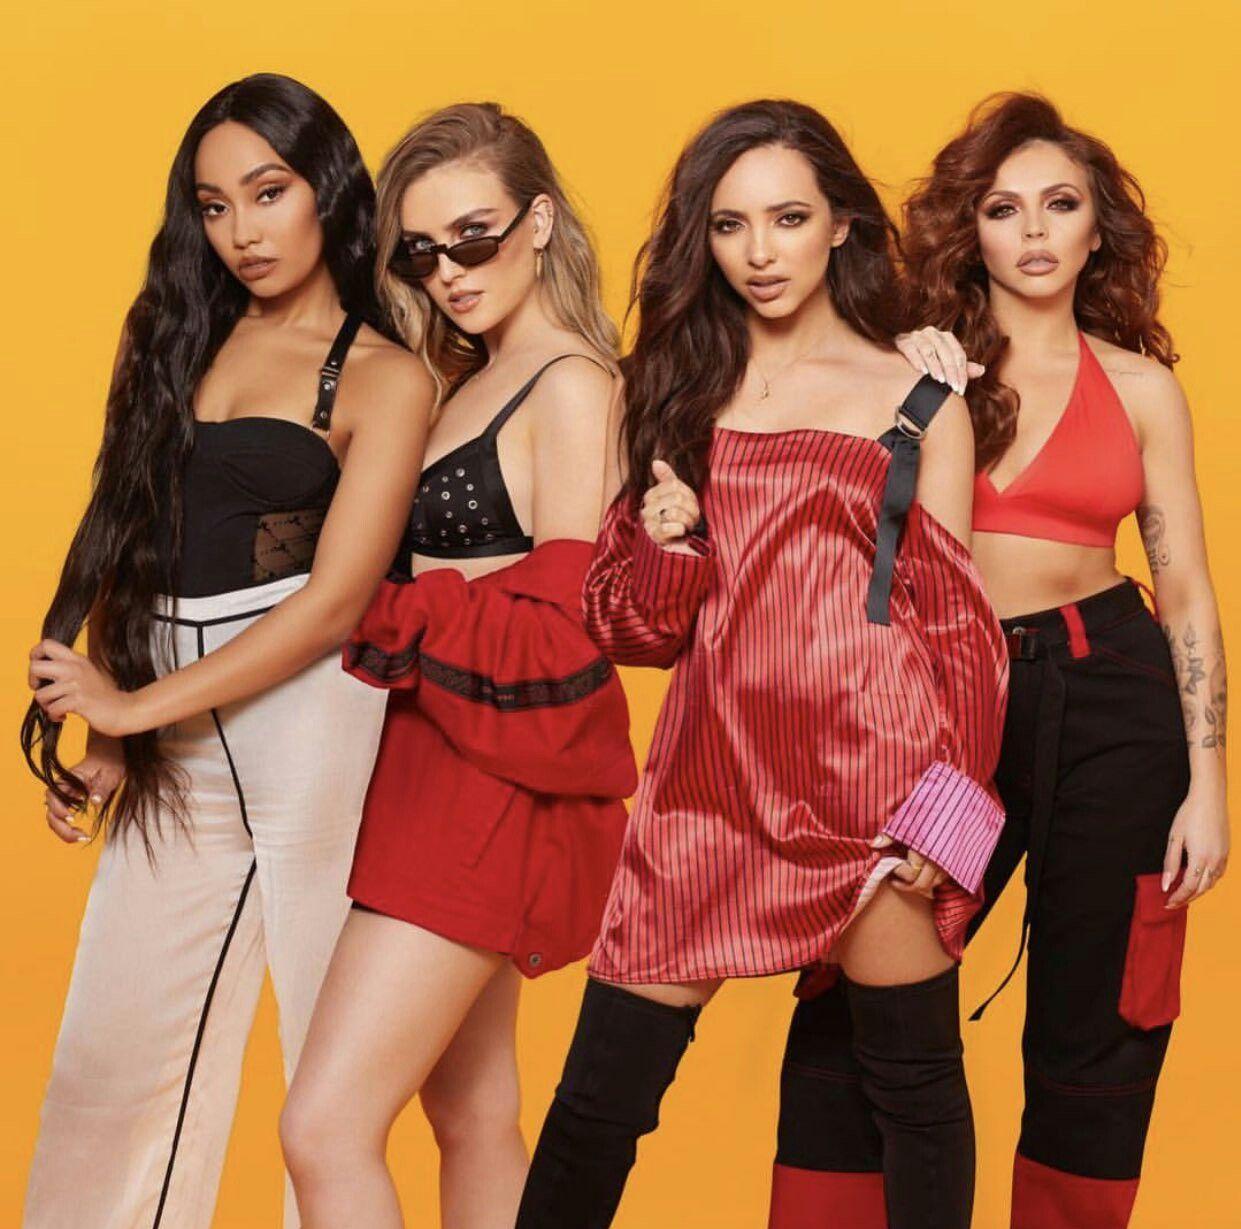 Little Mix LM5 photo shoot 2018 | Little mix outfits ...